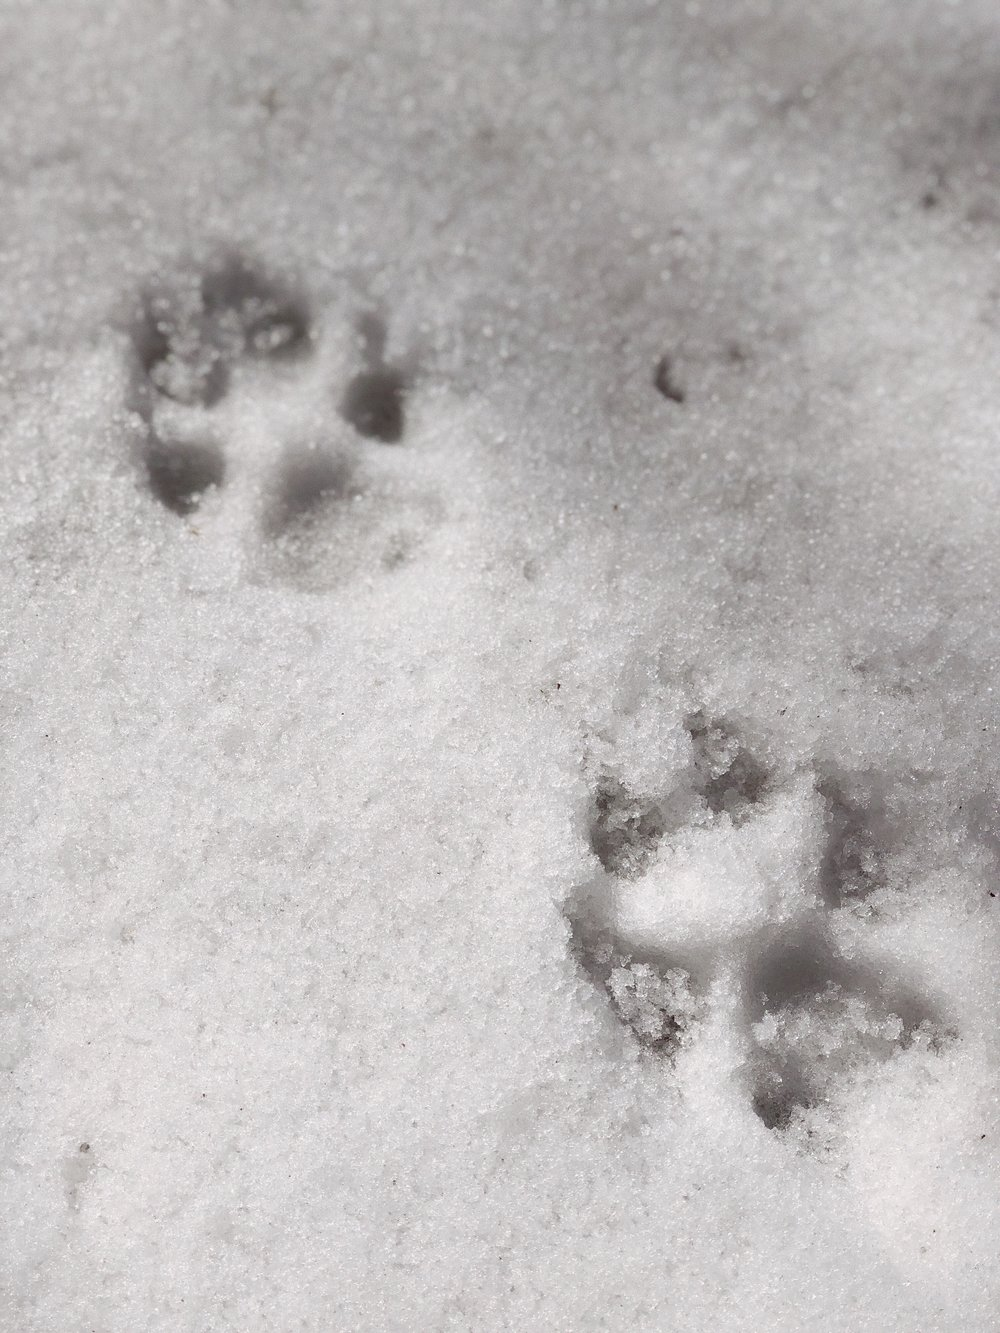 02.28.18_Lake Arrowhead_Samoyed Sumo_Ali Heiss_13.JPG